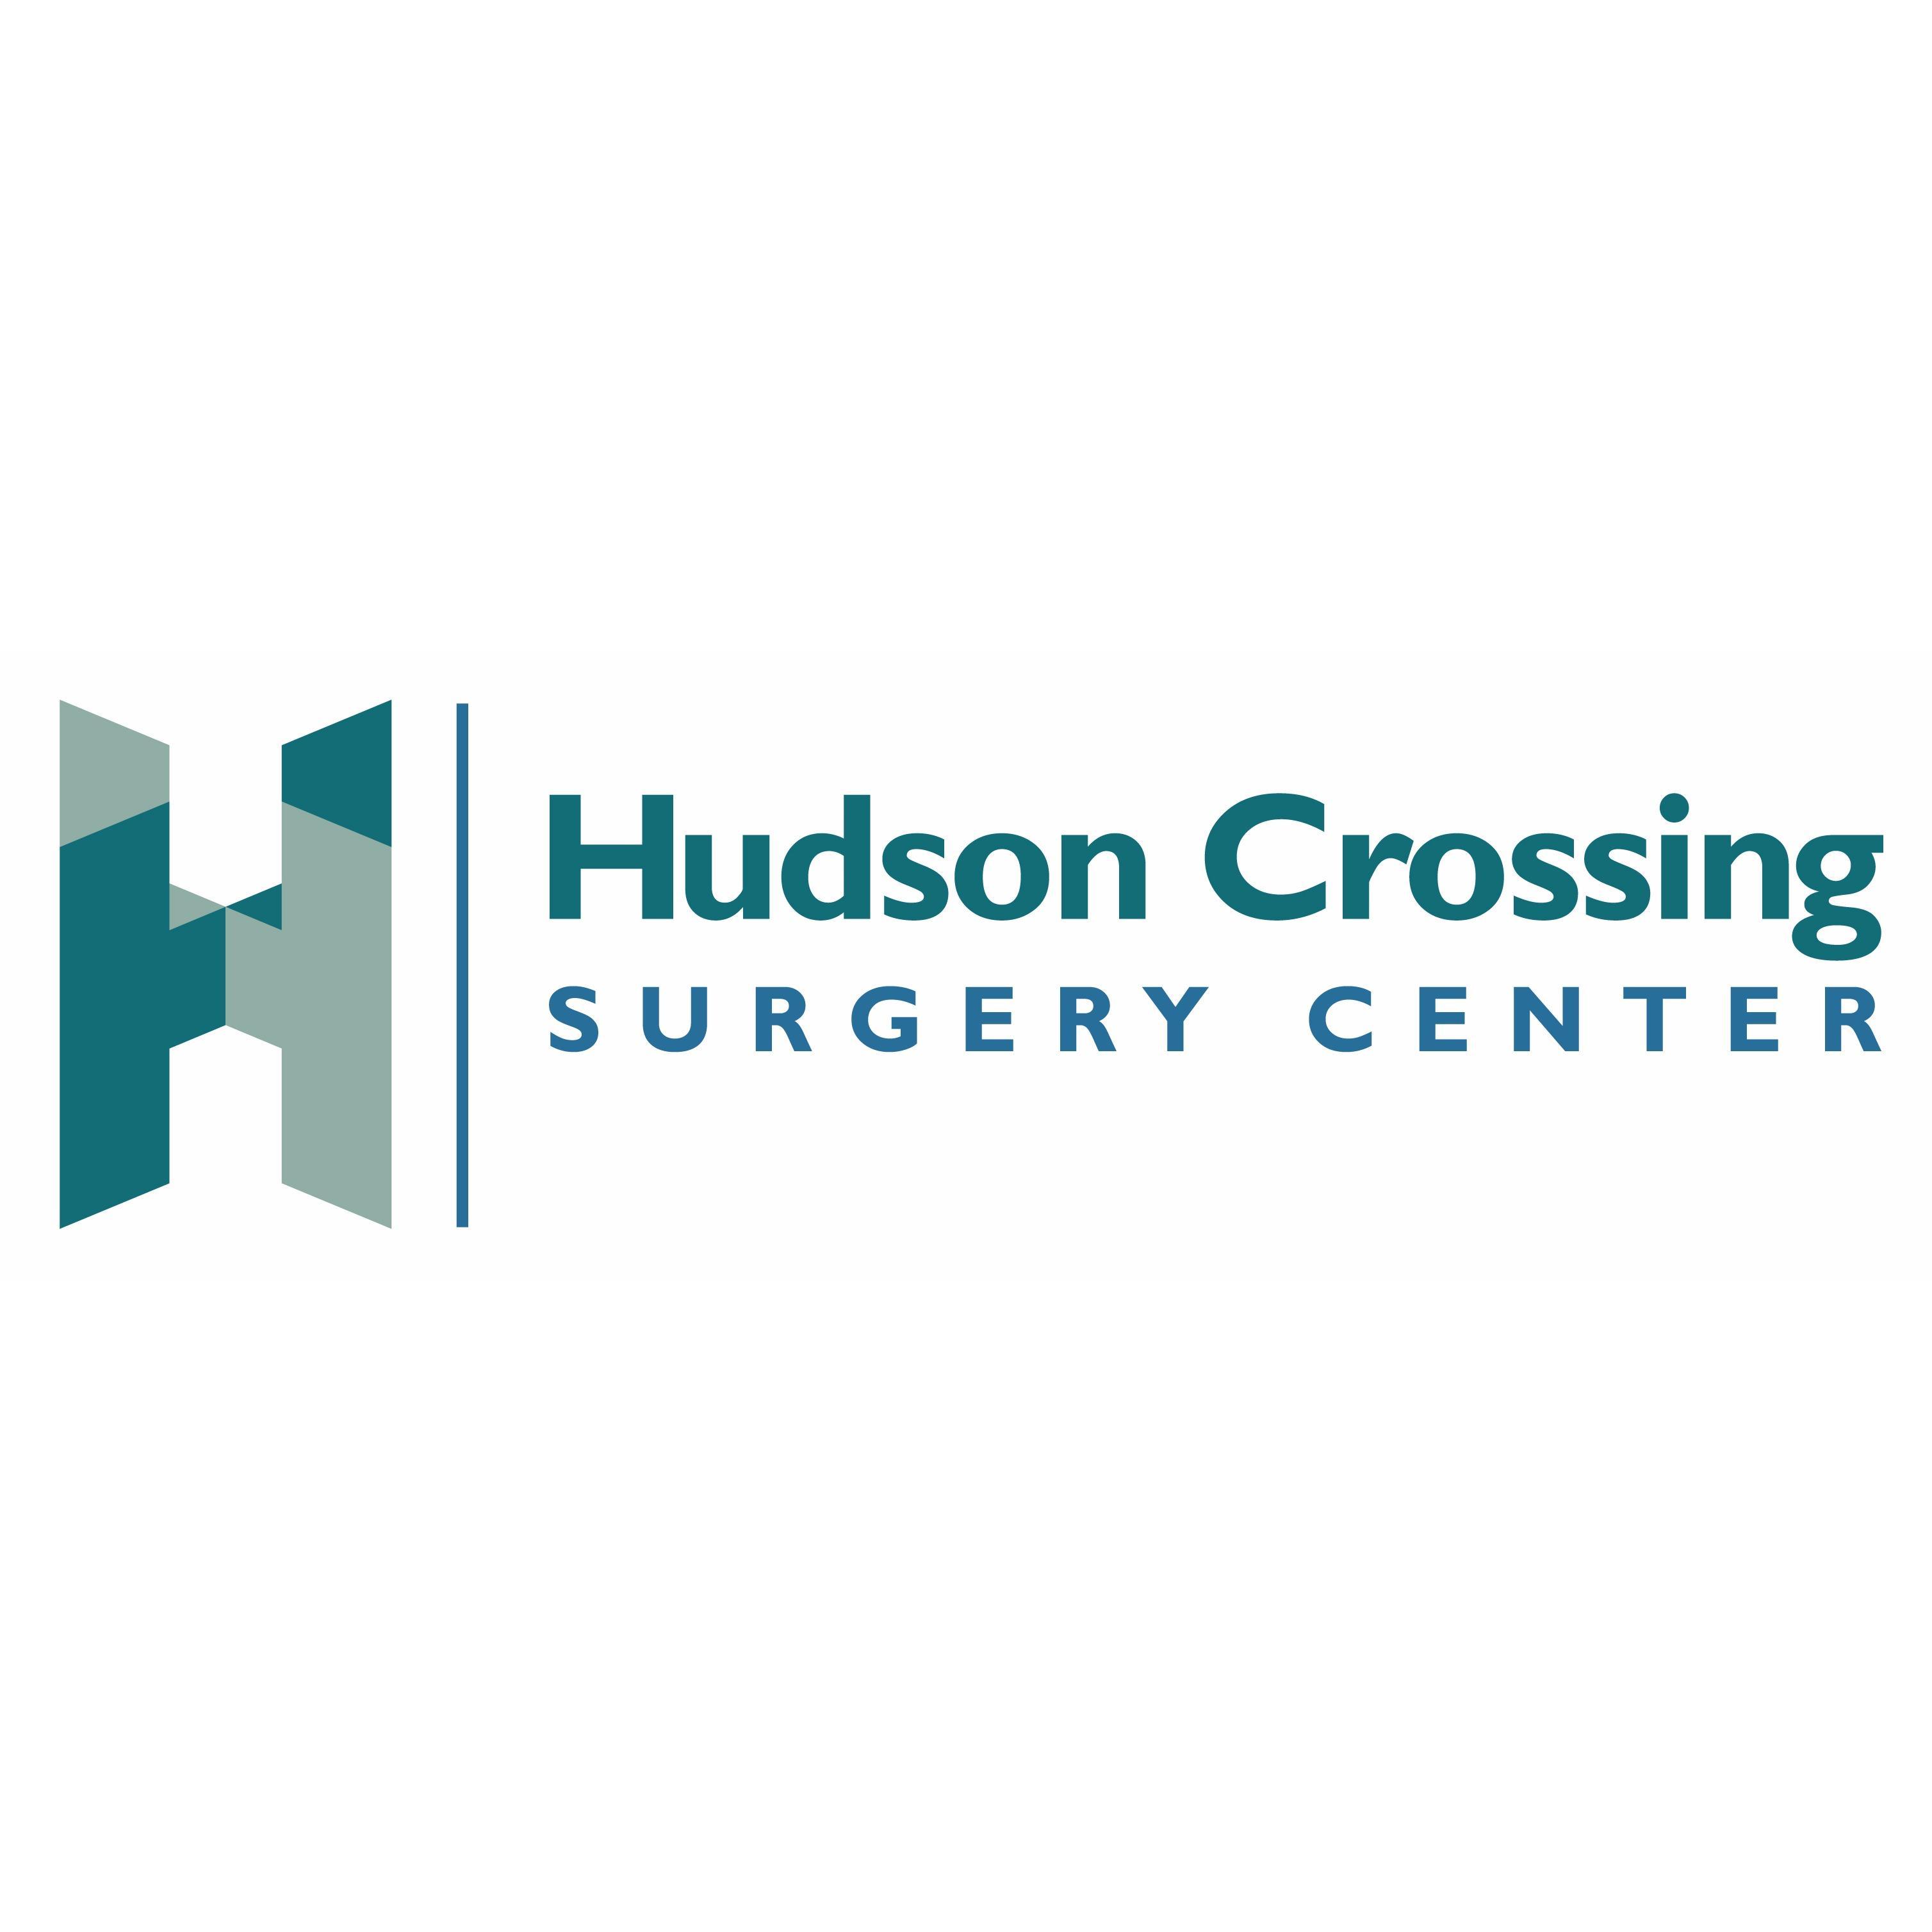 Hudson Crossing Surgery Center